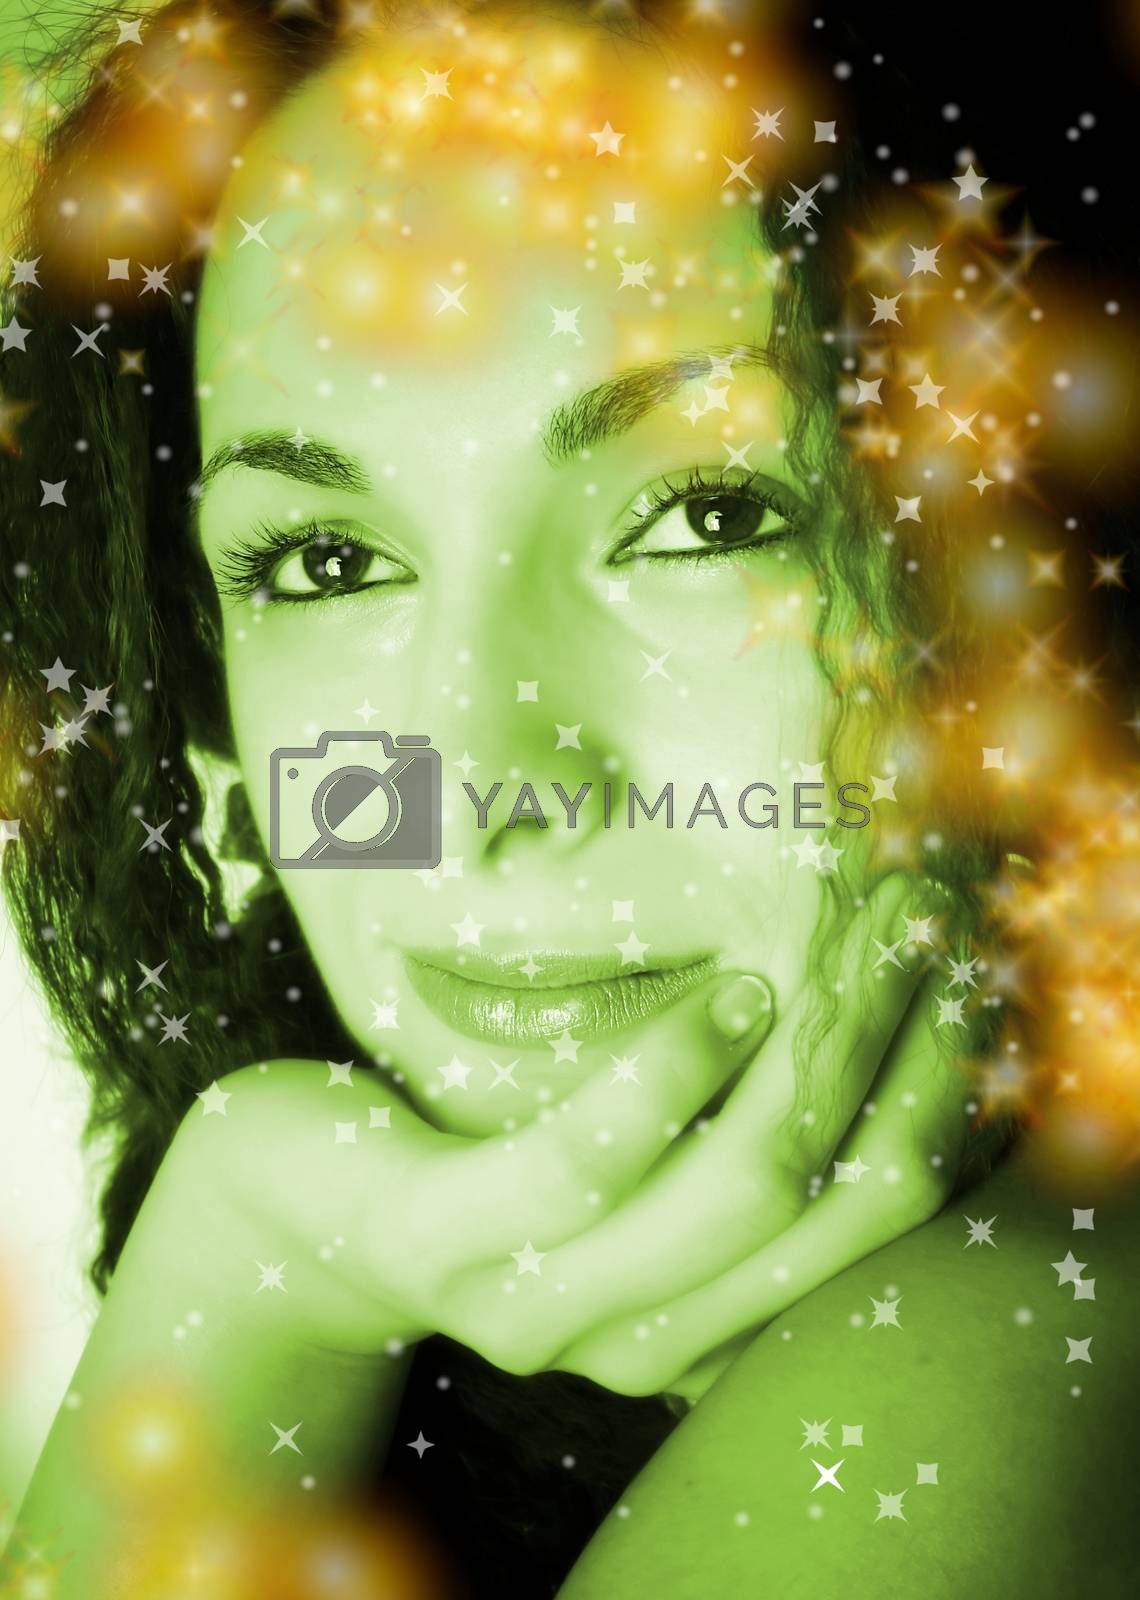 Macro image of a beautiful girl face